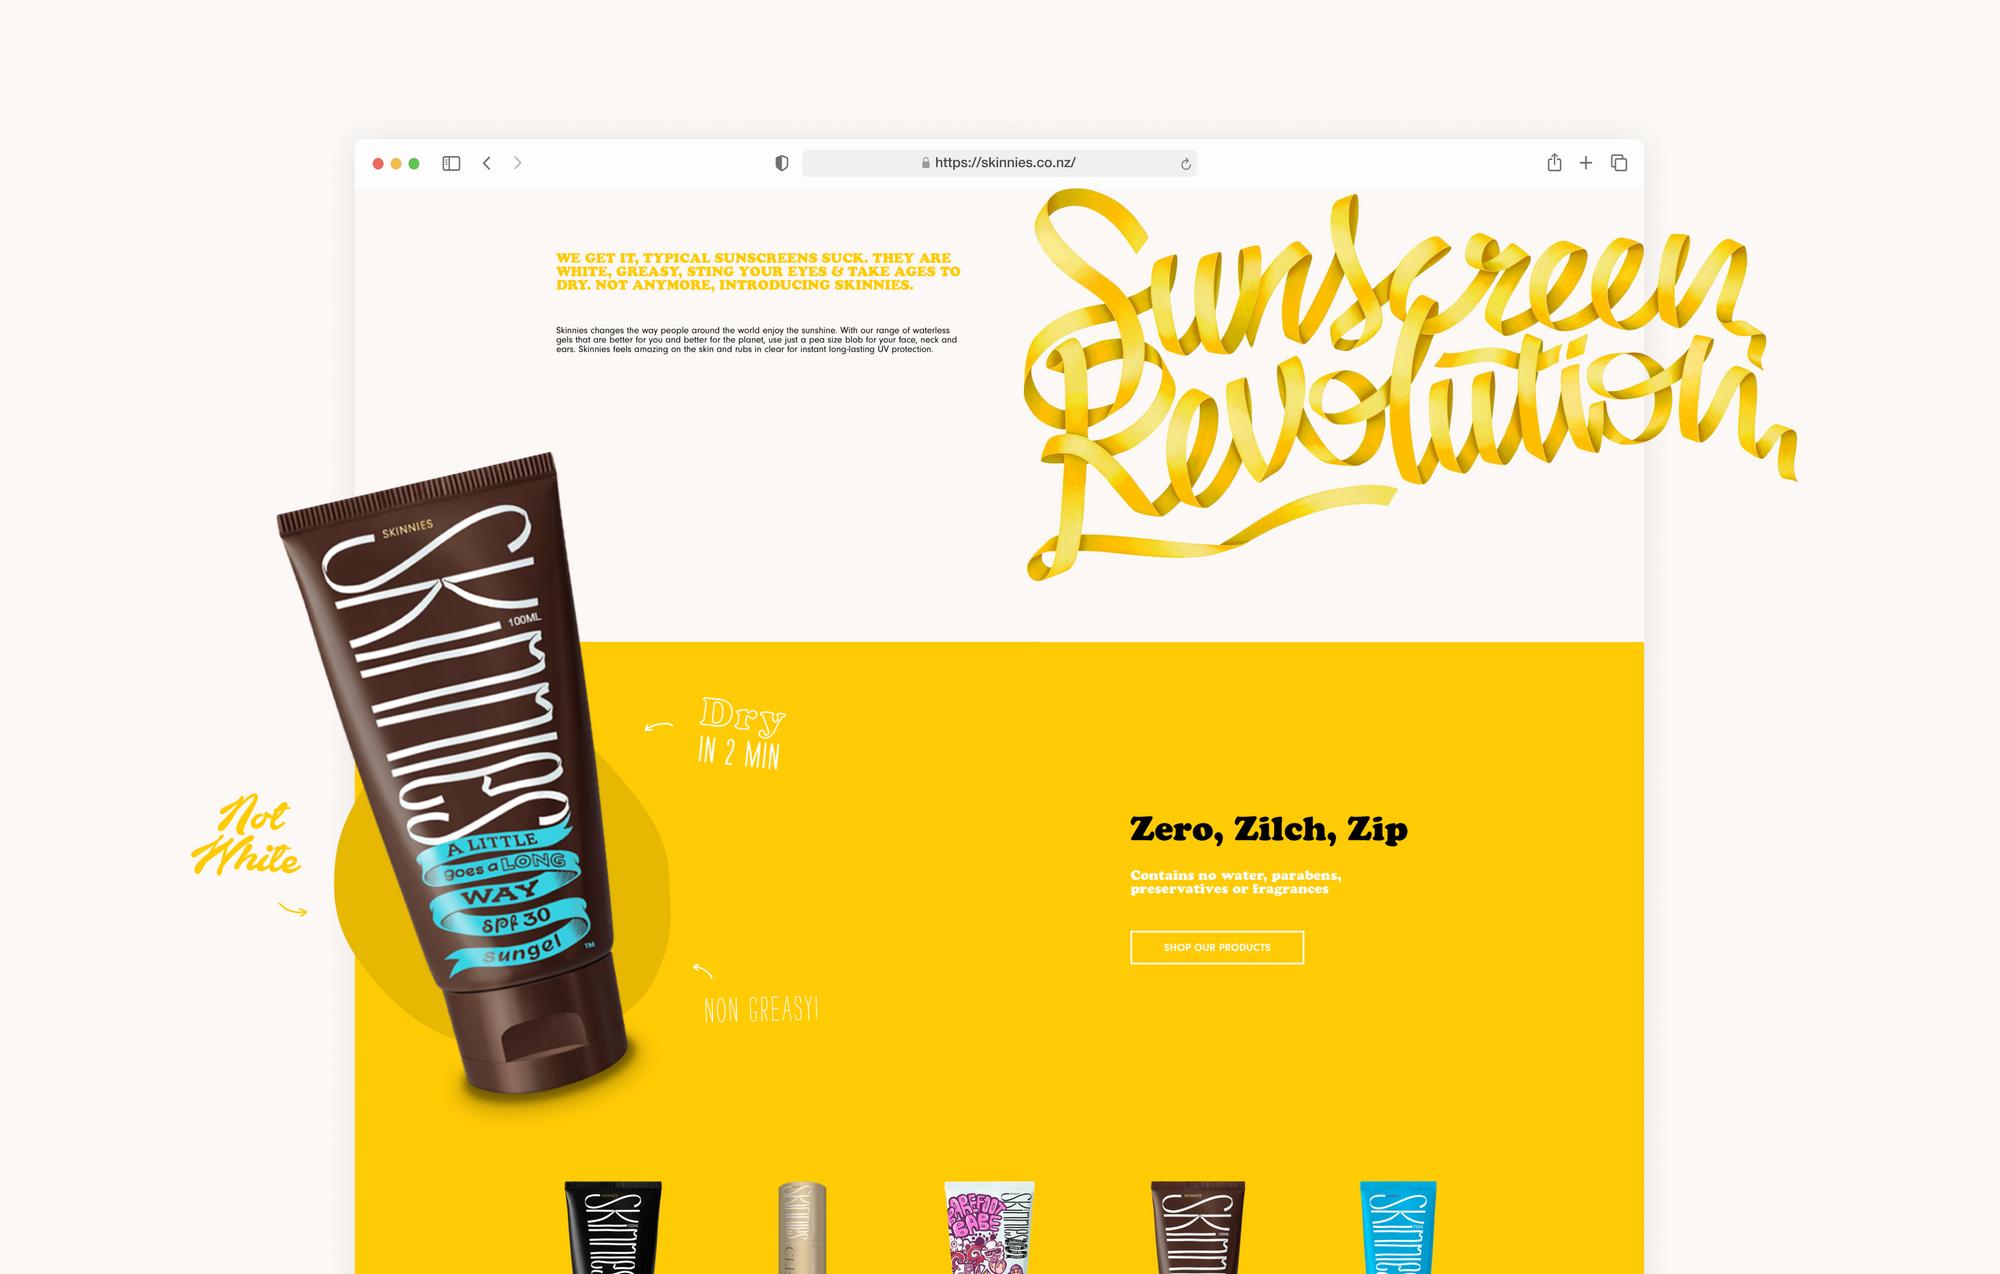 Skinnies - digital marketing